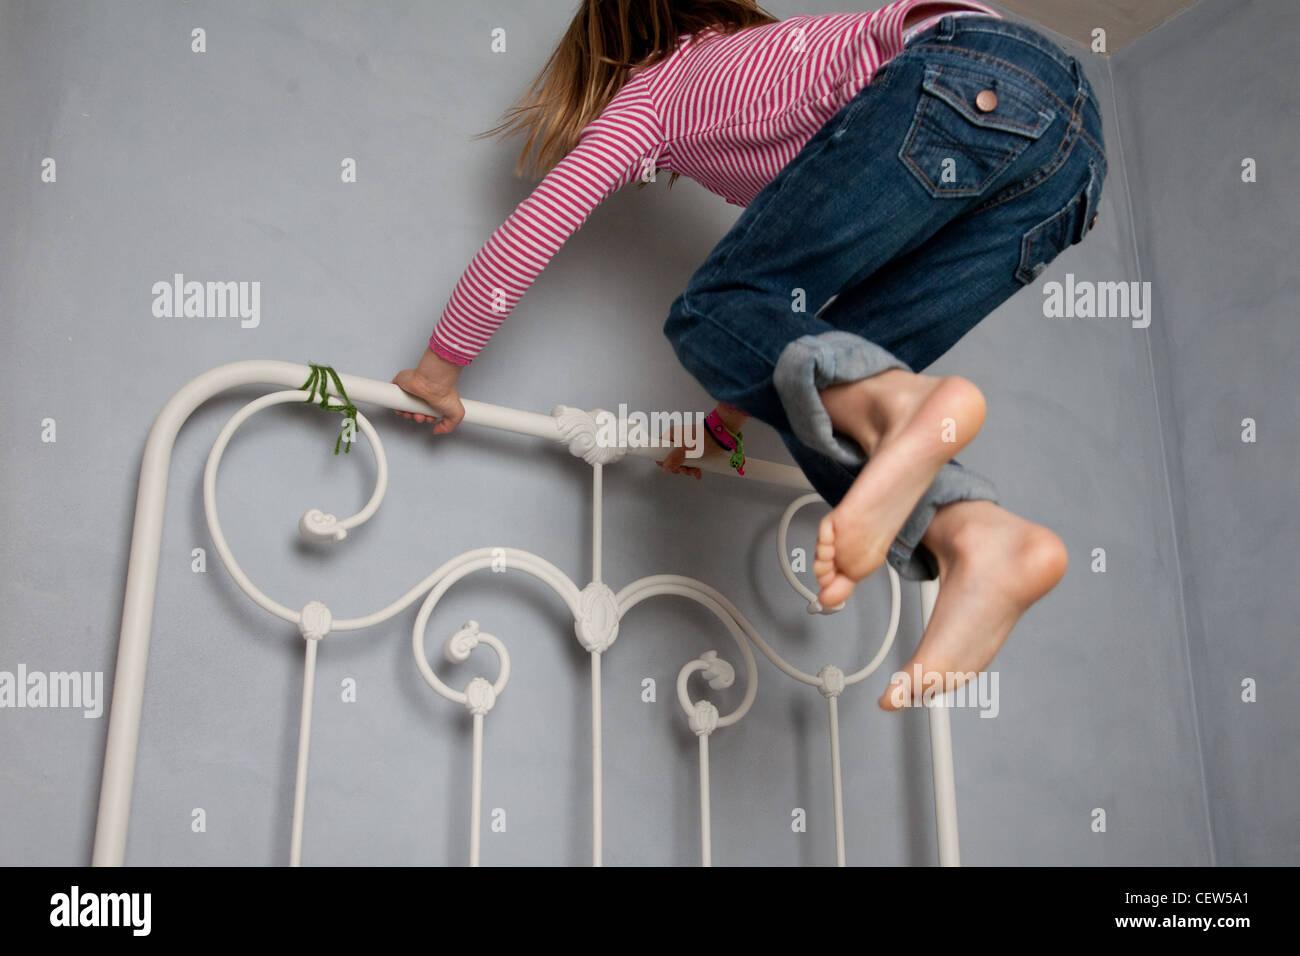 Feet Jump Stockfotos & Feet Jump Bilder - Alamy